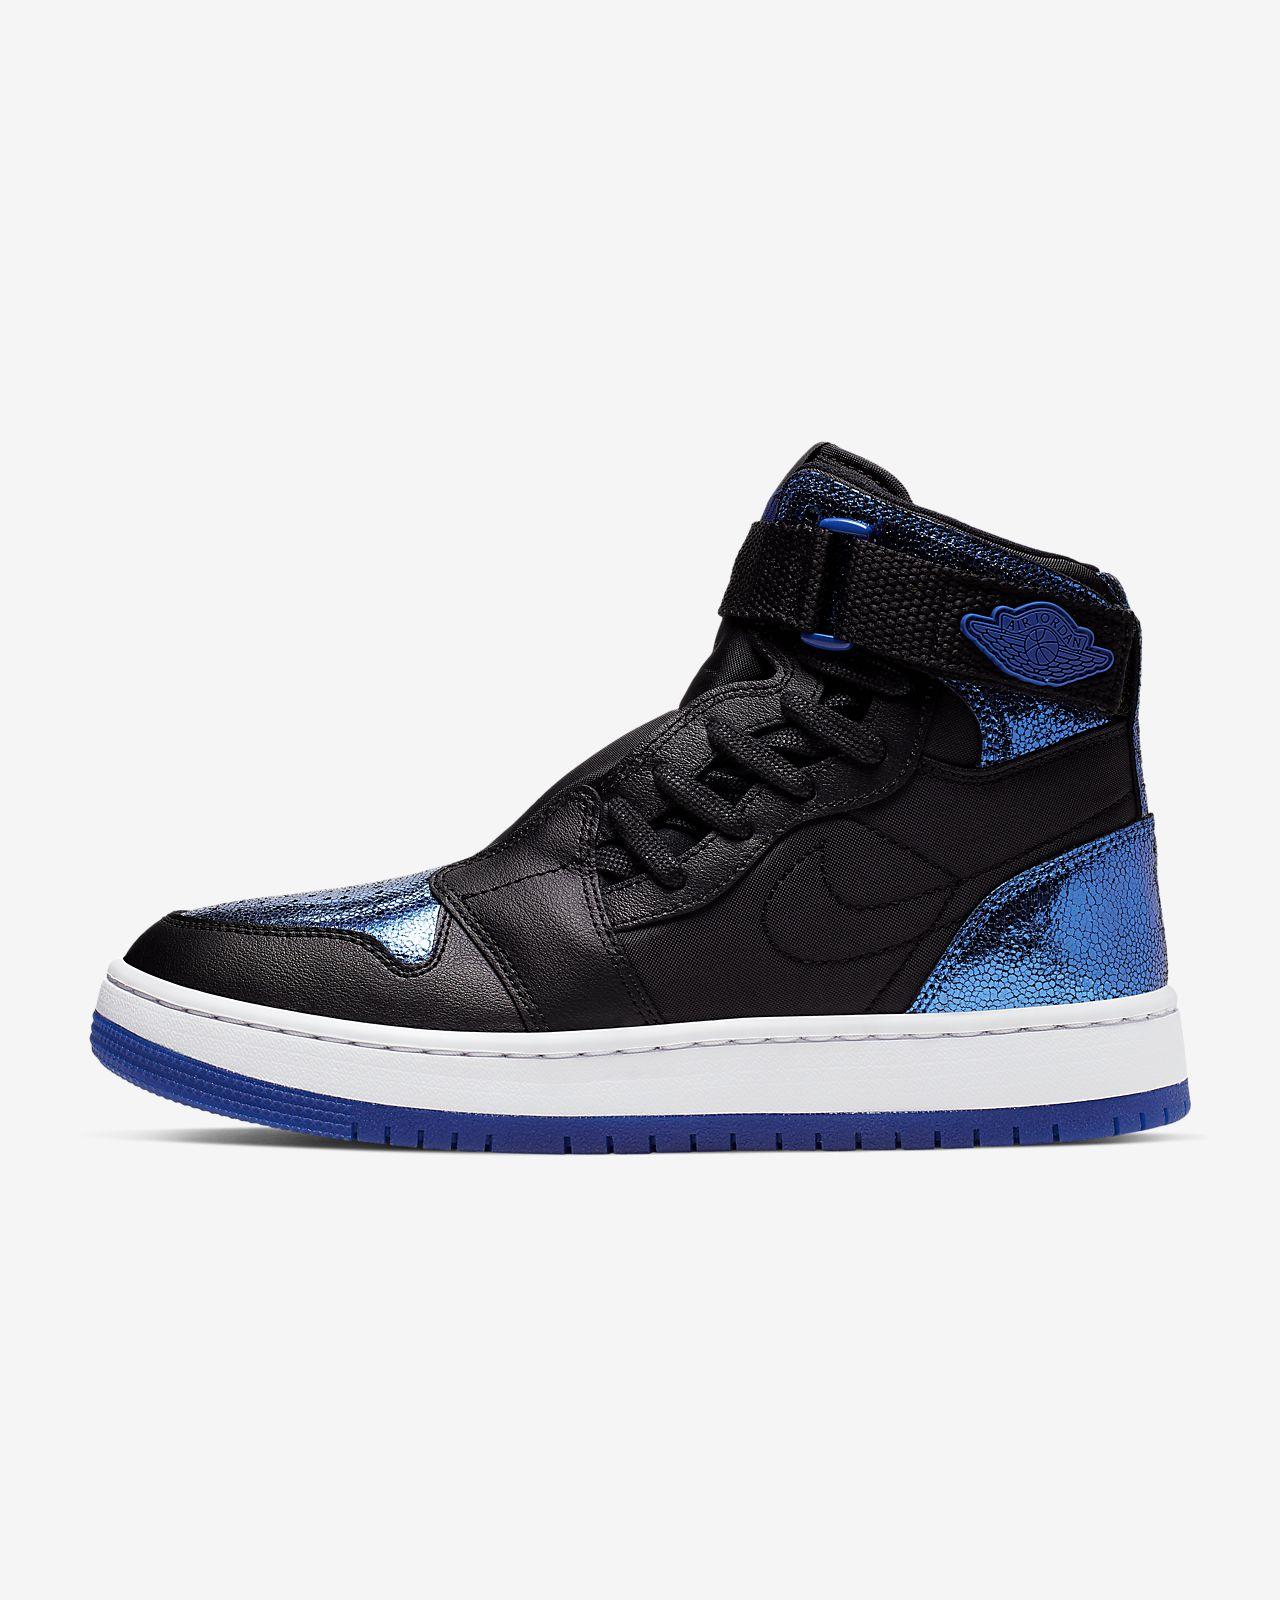 Chaussure Air Jordan 1 Nova XX pour Femme